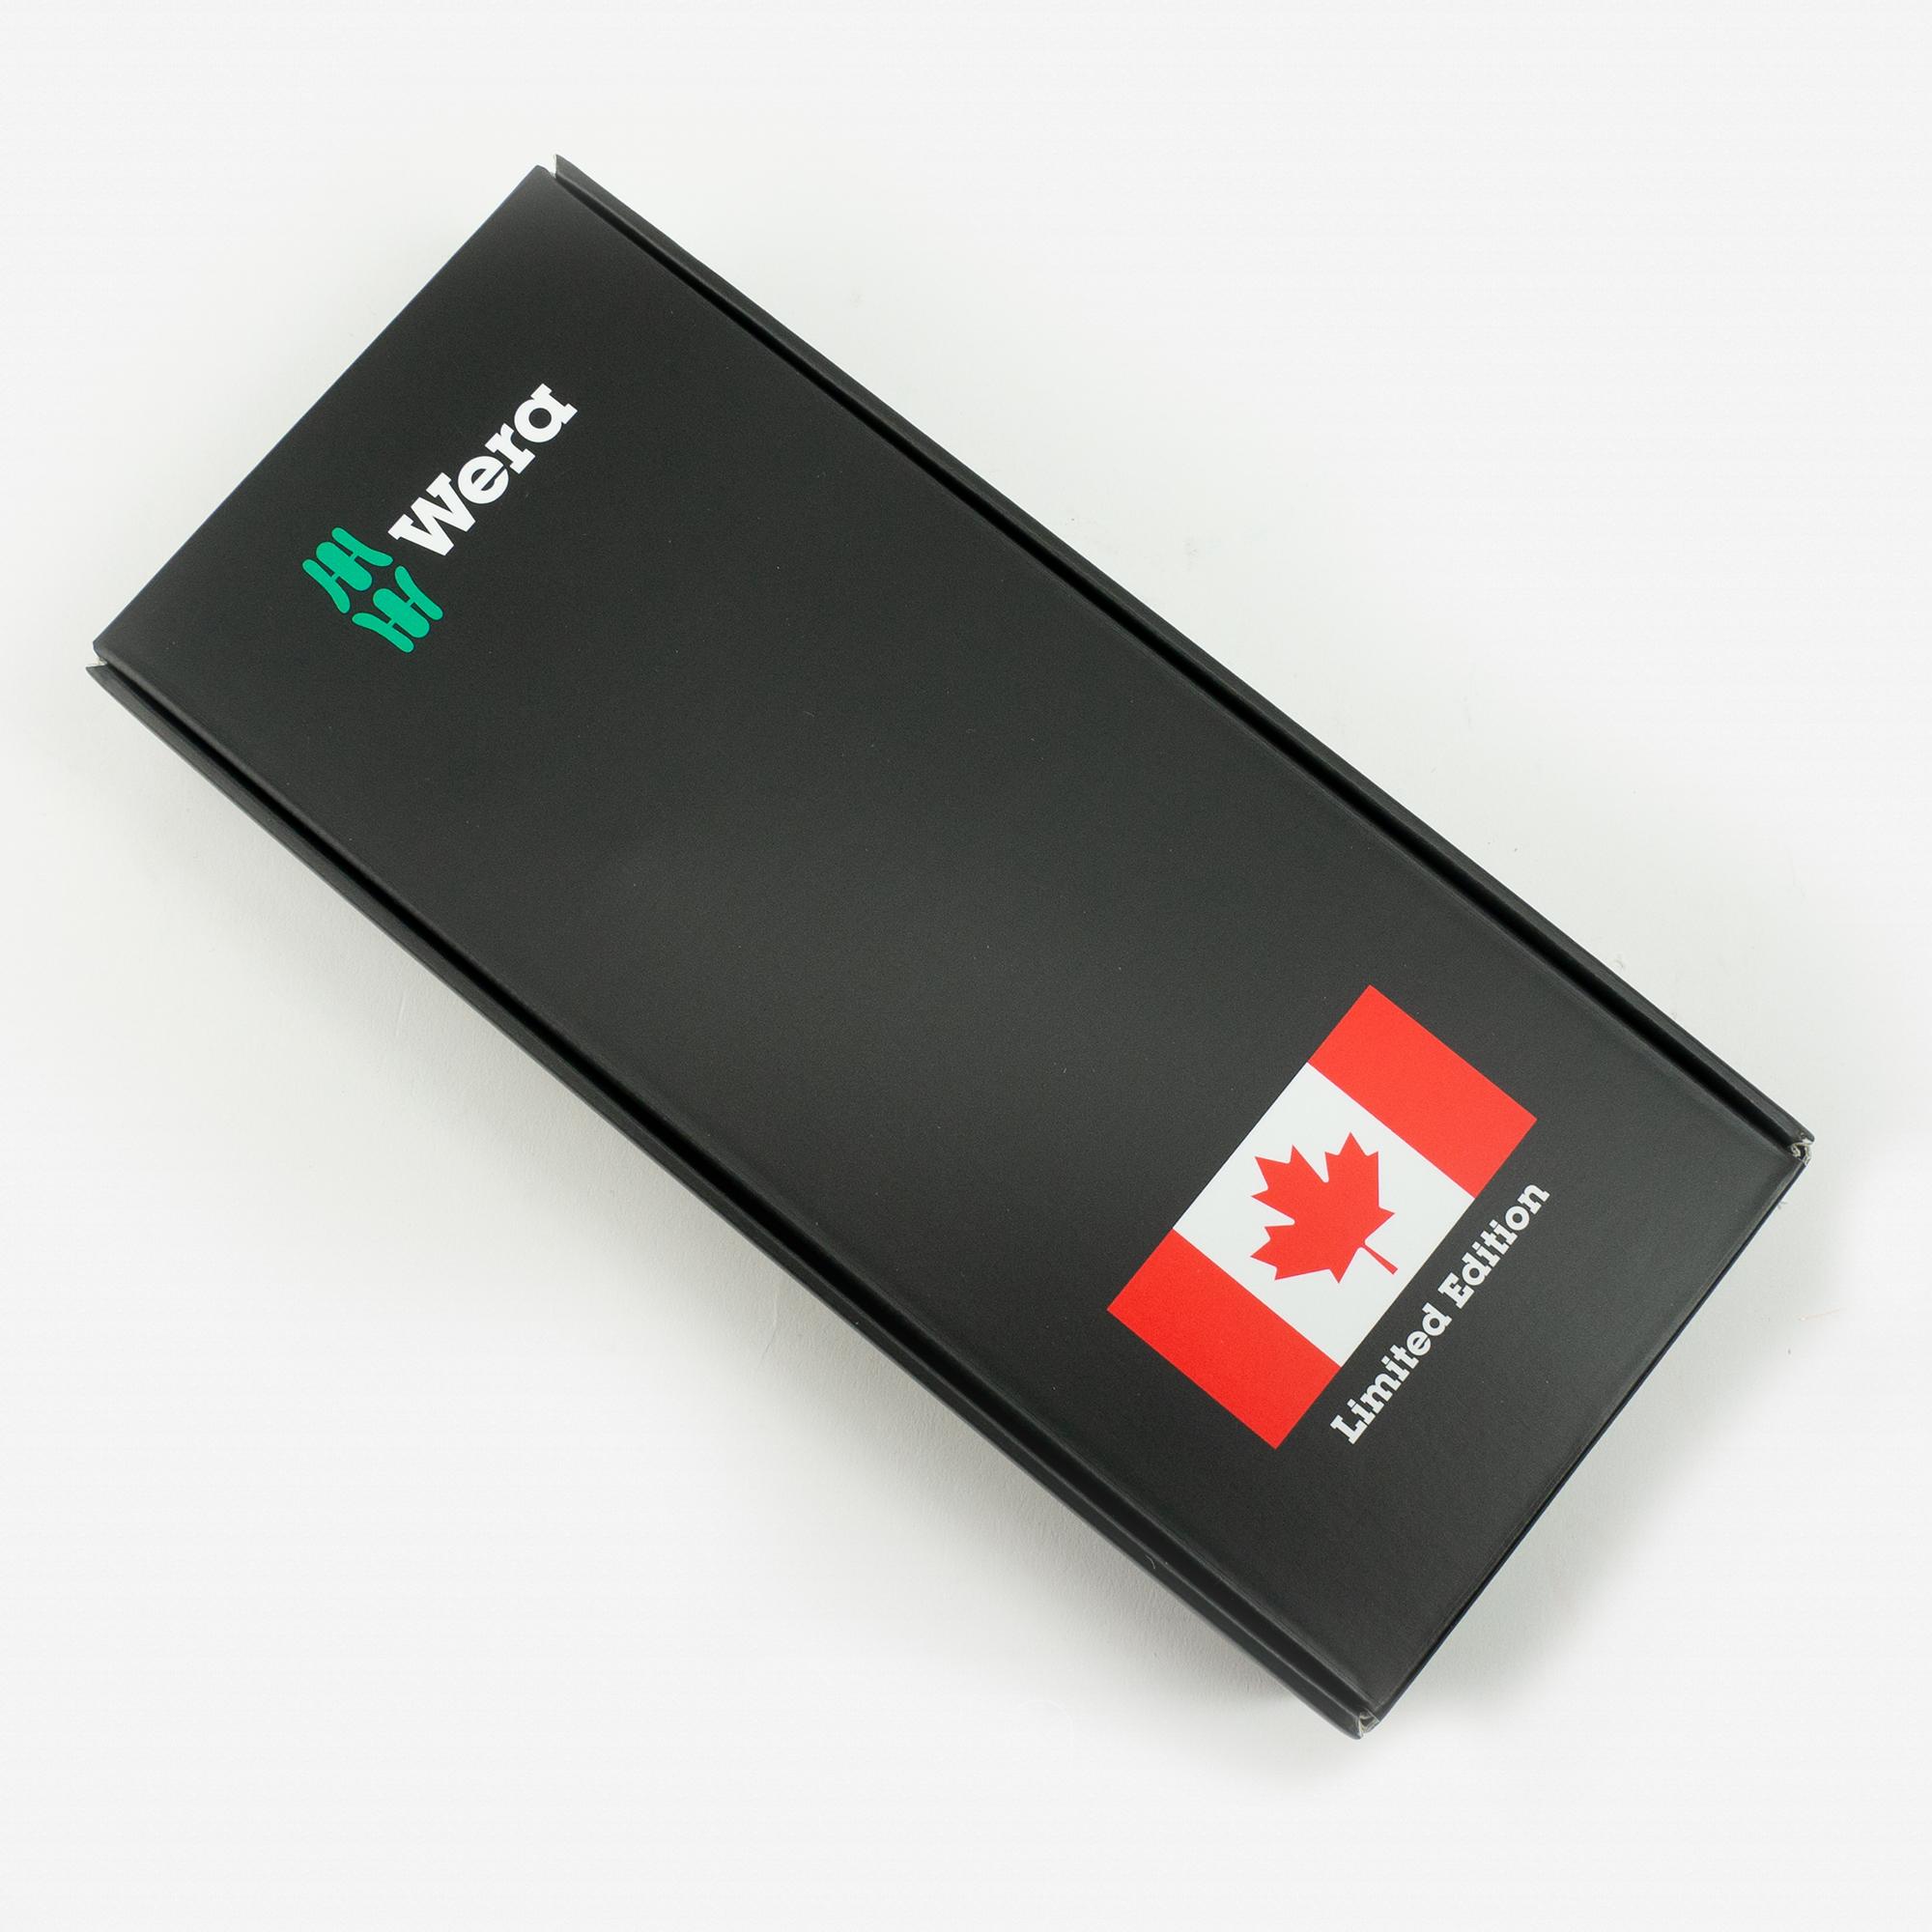 Wera 300052 Kraftform Canada Bottle Opener Set - Square, Limited Edition - KC Tool